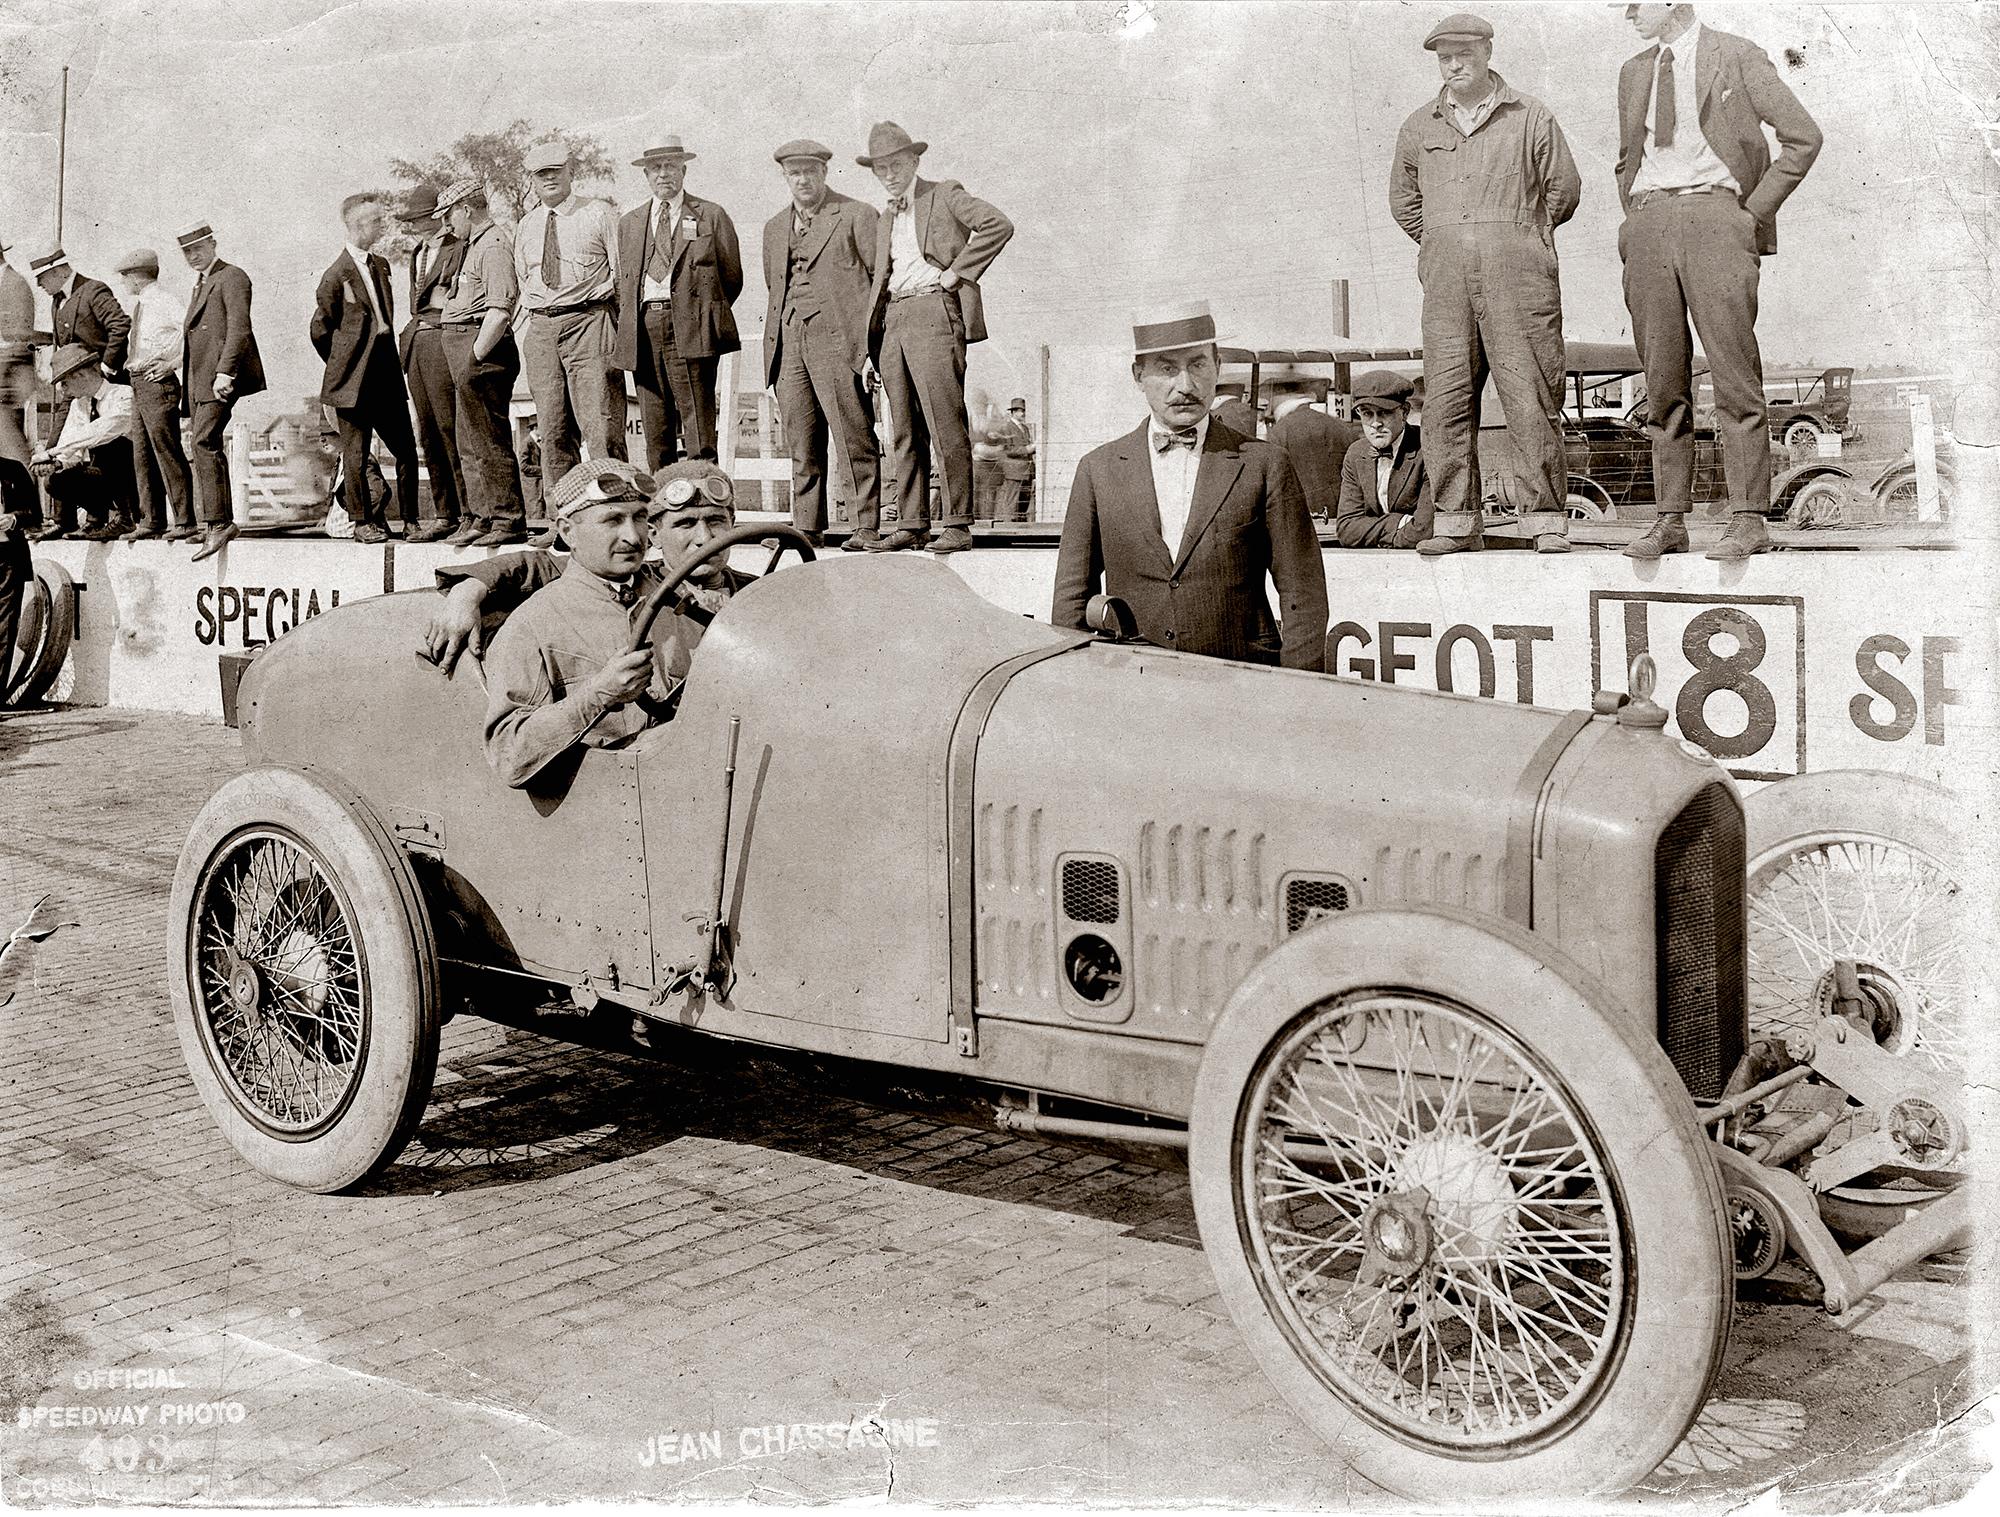 #45, Ballot, 3/8 LC, Indianapolis, Rennwagen